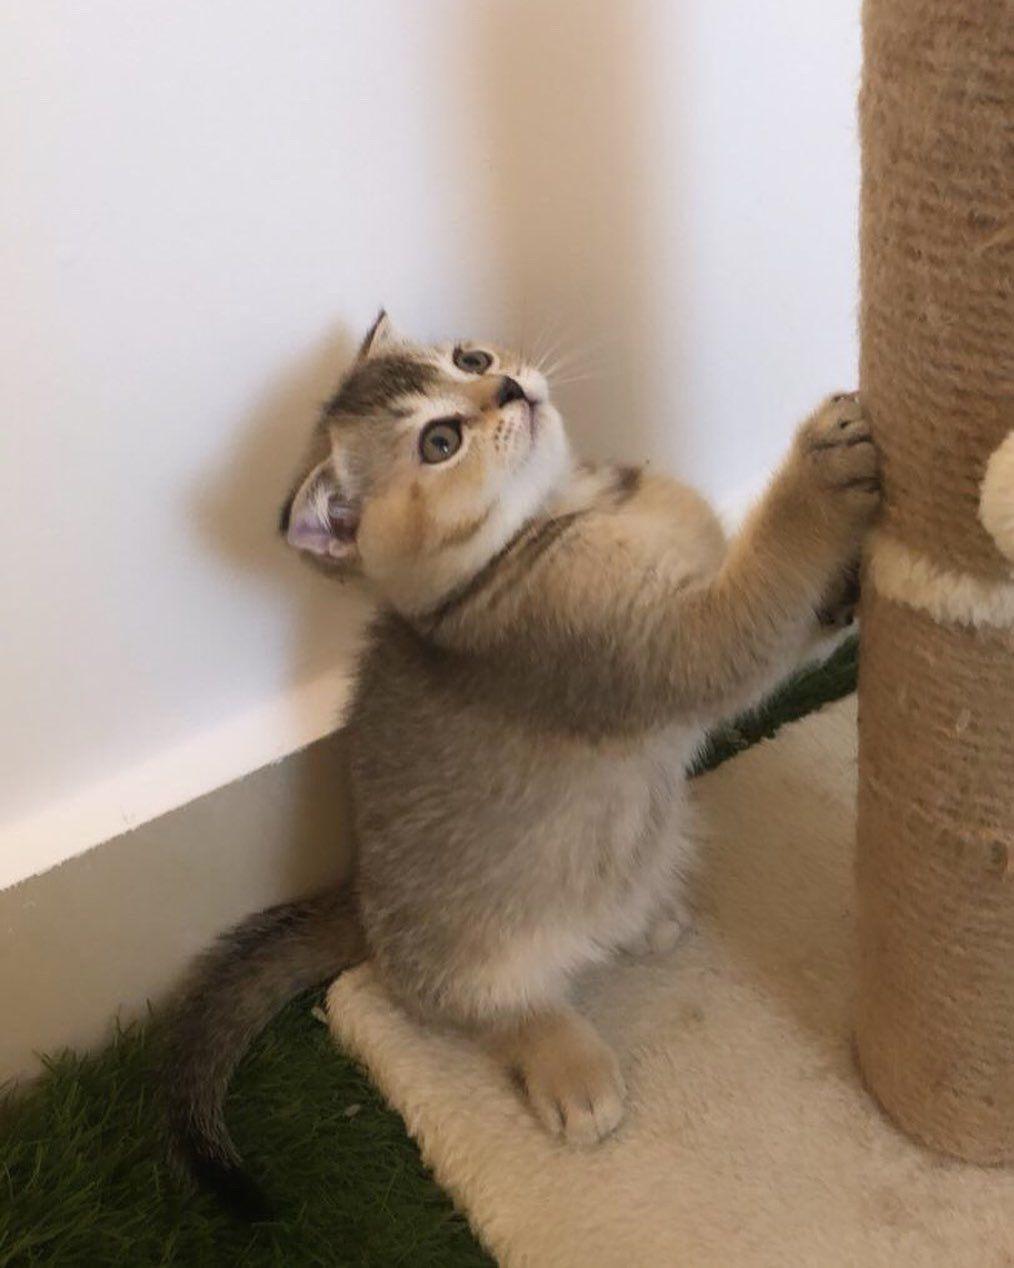 Golden Cat ماشاءالله تبارك الله من انتاجنا ذكر سكوتش فولد بيور من ام واب وارد من إسكتلندا F Cats Animals